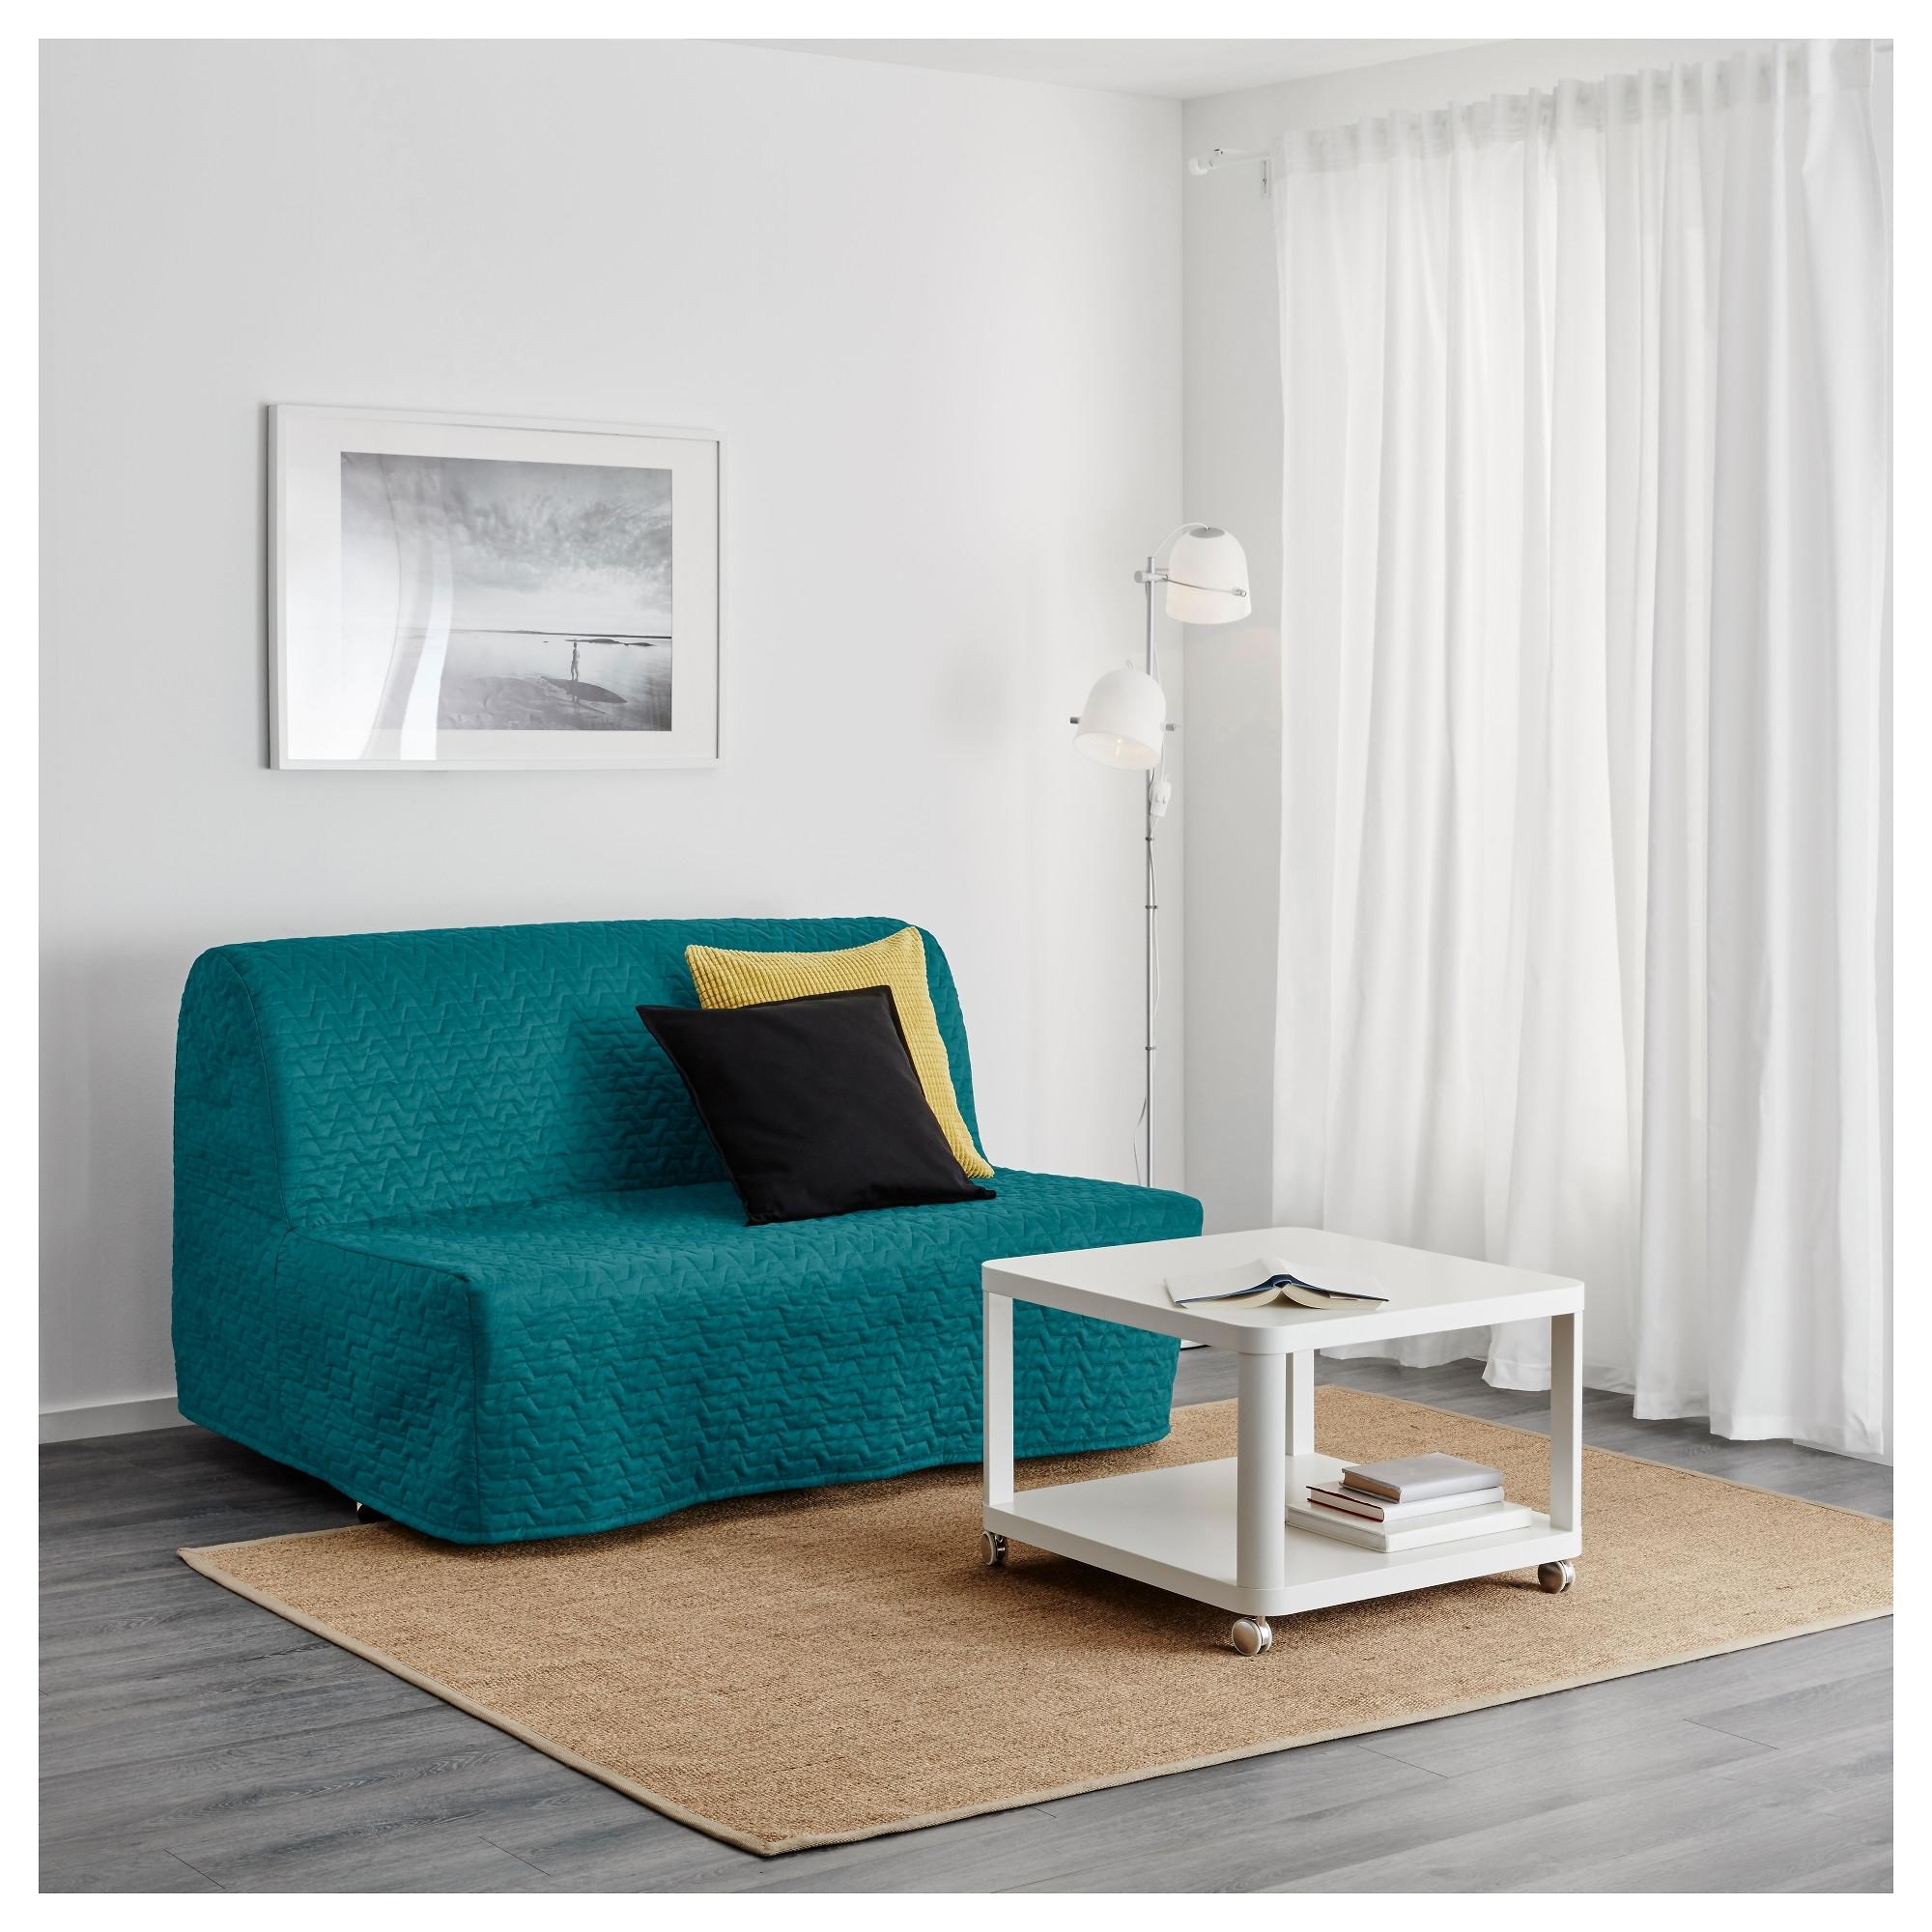 Favorite Turquoise Sofas With Lycksele Lövås Sleeper Sofa – Ransta White – Ikea (View 12 of 15)